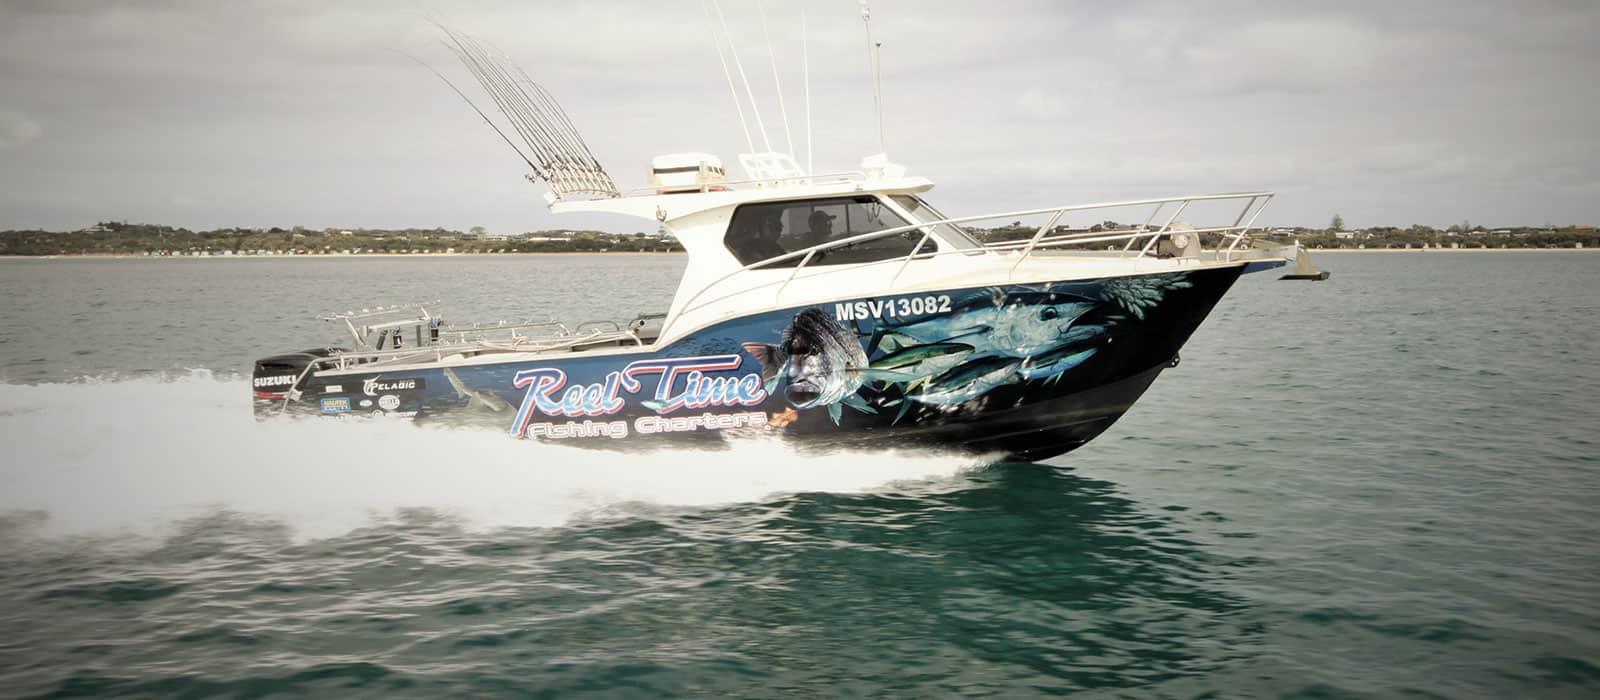 Marine Surveyor - Annual perdioc survey for the vessel fishing charters